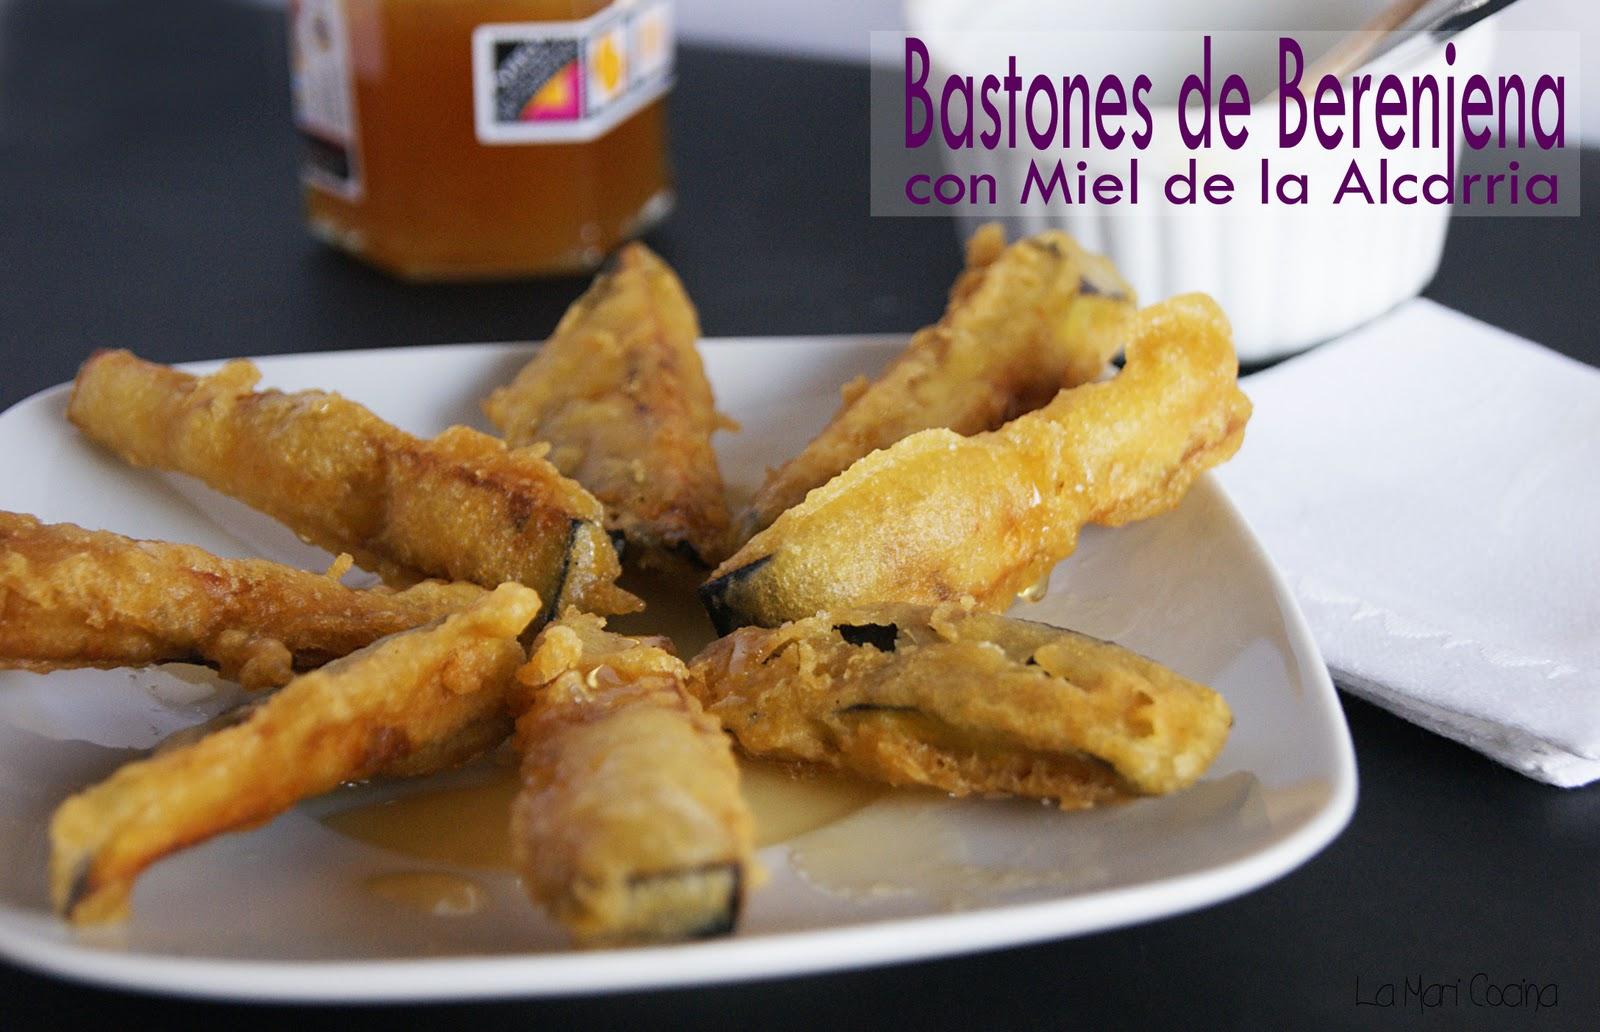 La Mari Cocina: Bastones de Berenjena con Miel de la Alcarria